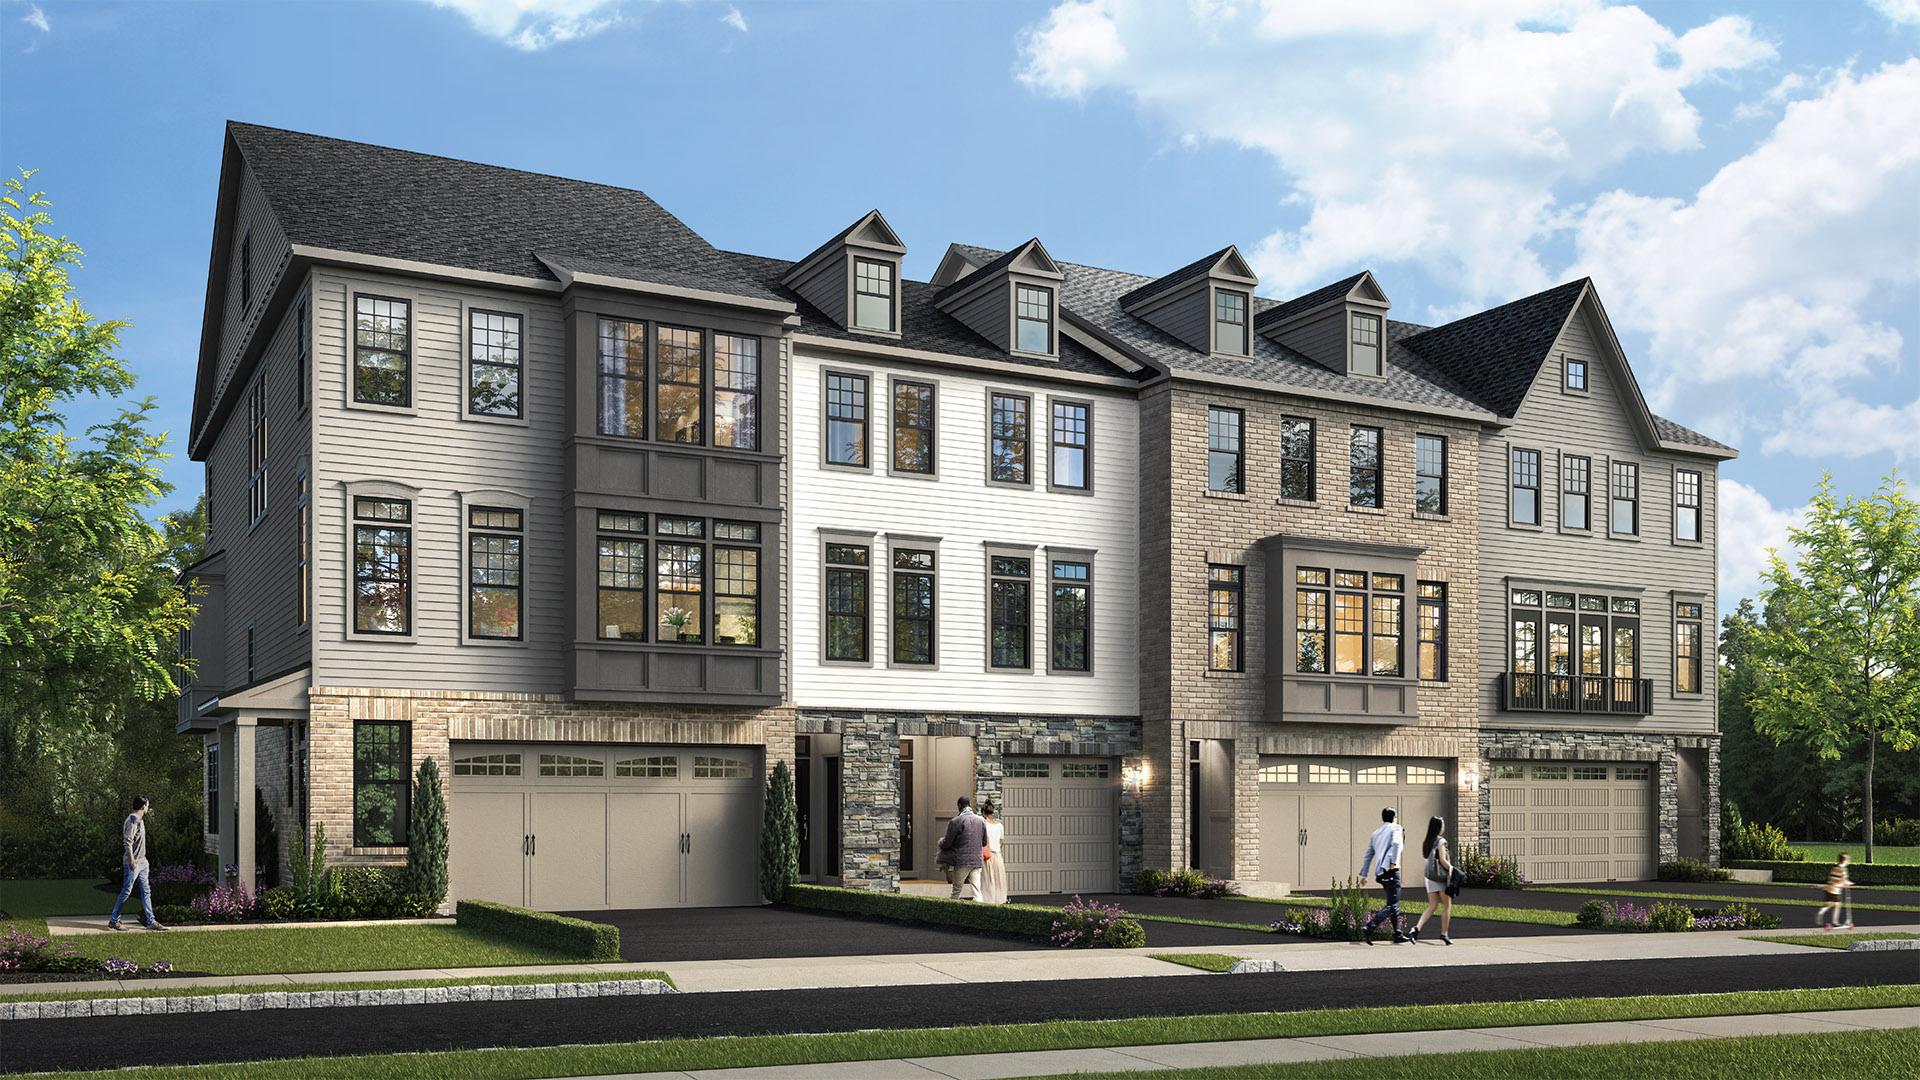 Upper Saddle River Nj >> New Luxury Homes For Sale In Upper Saddle River Nj The